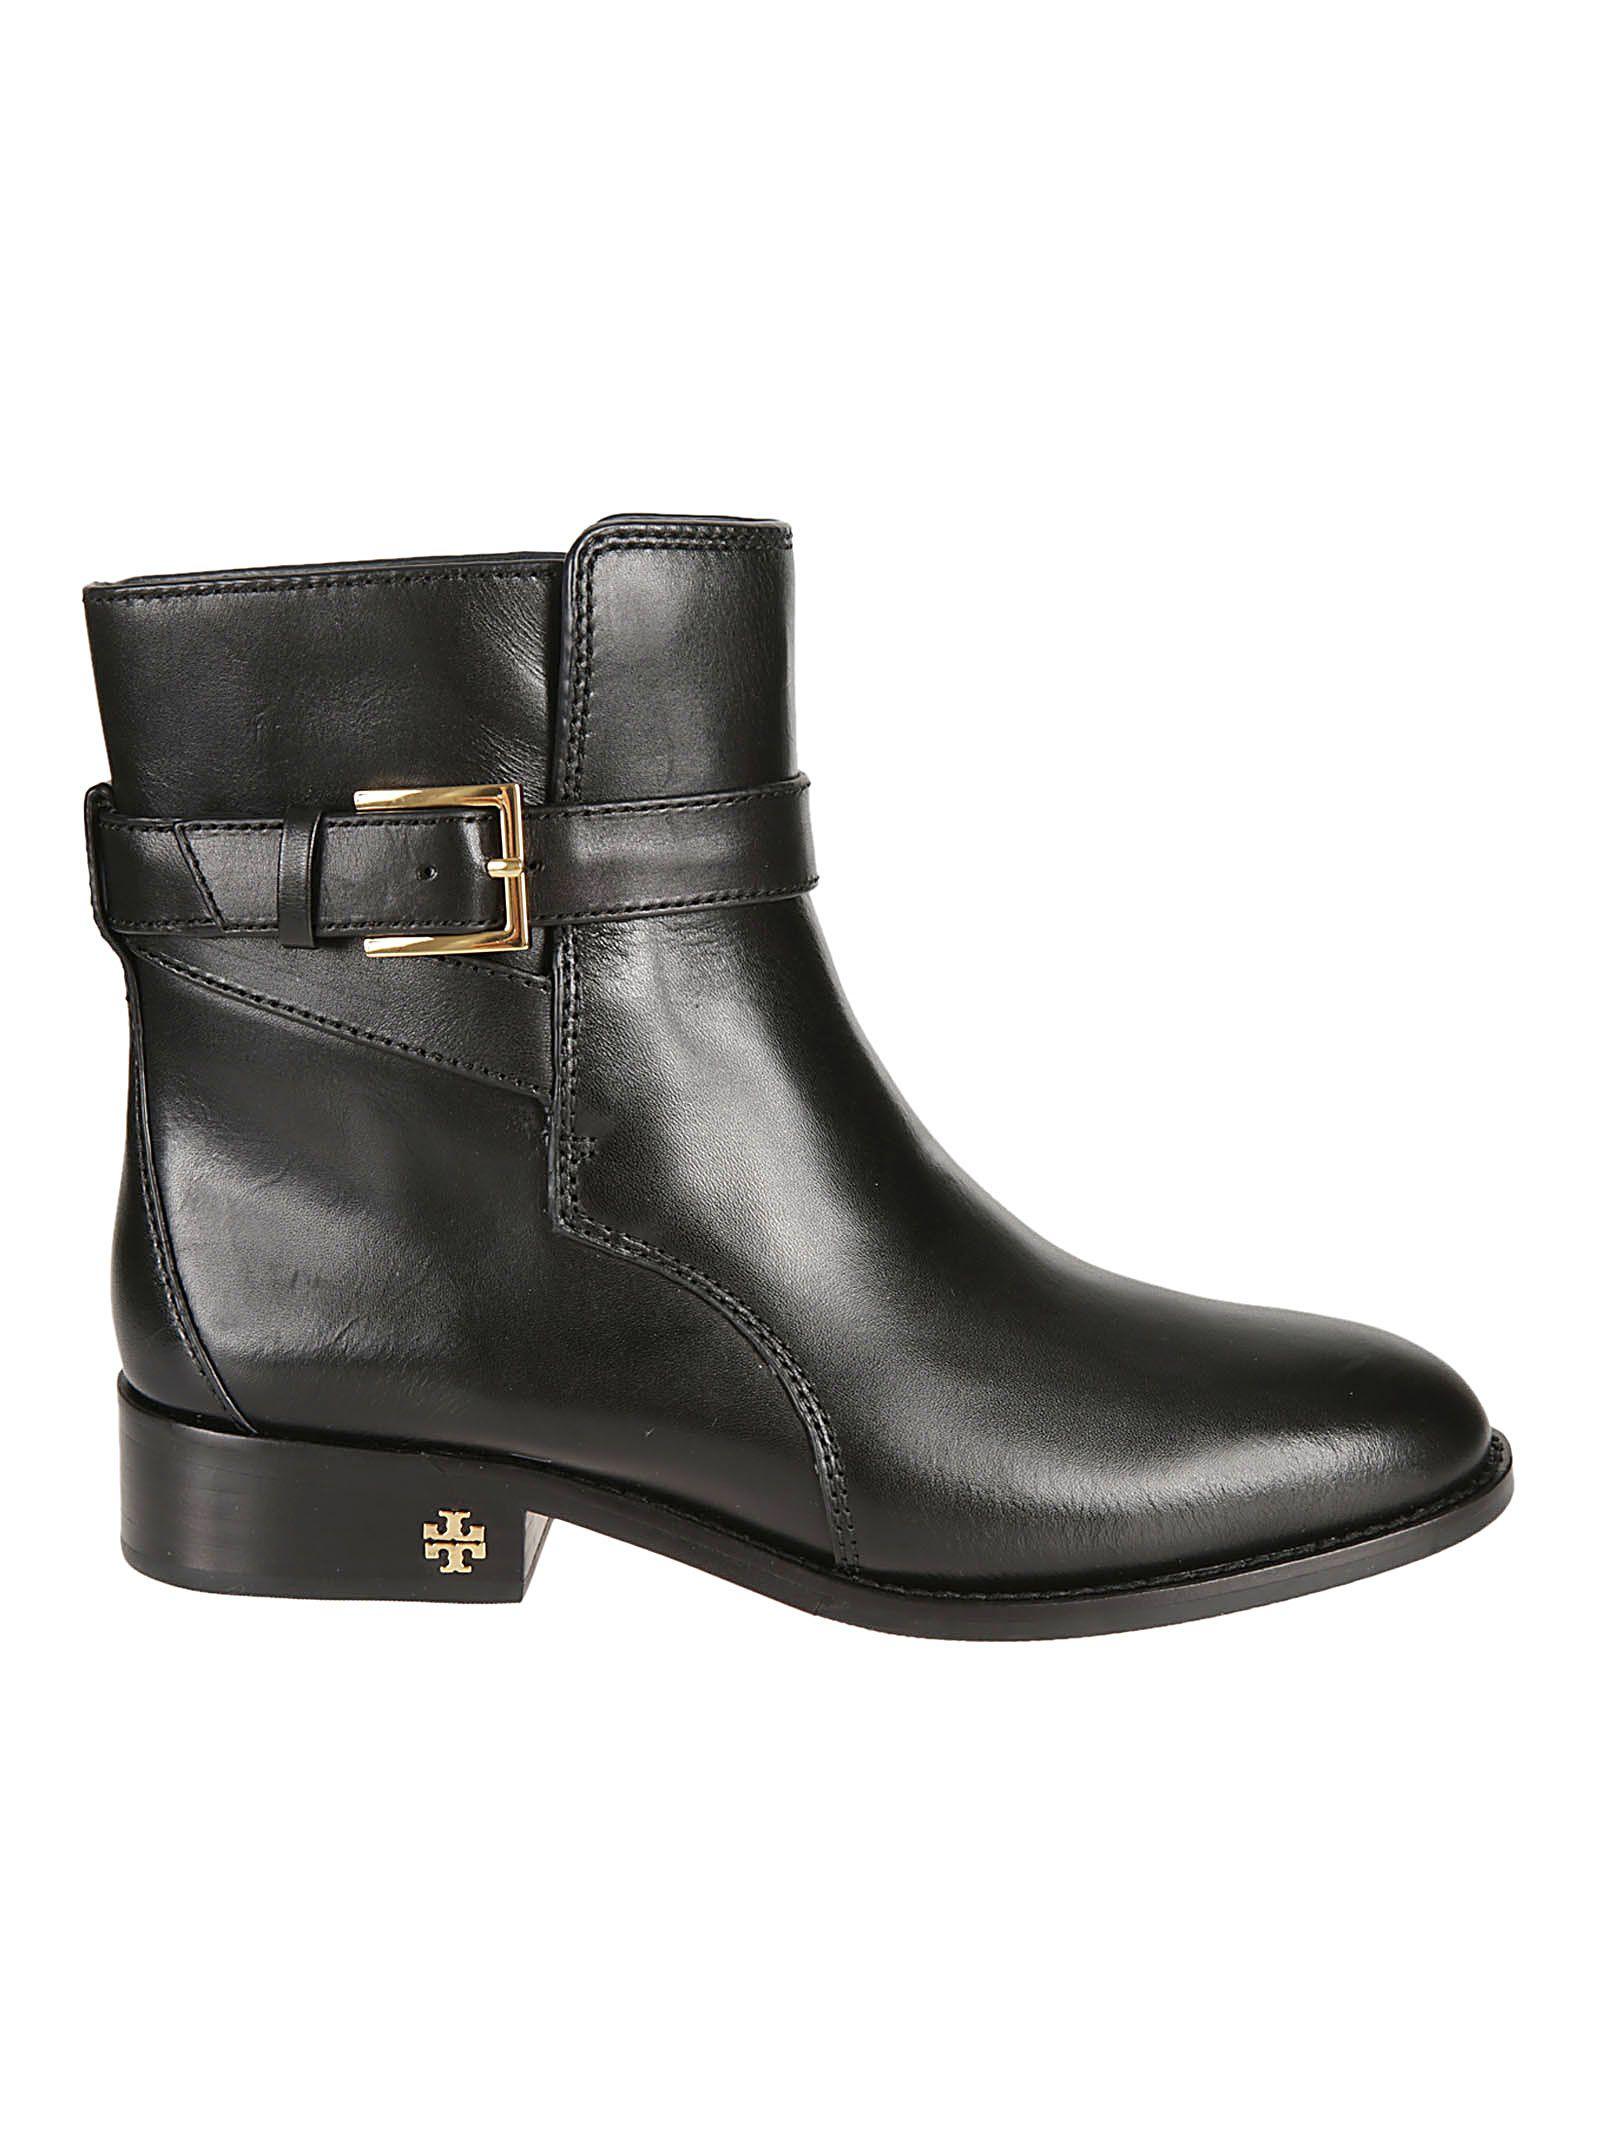 Tory Burch Brooke Boots